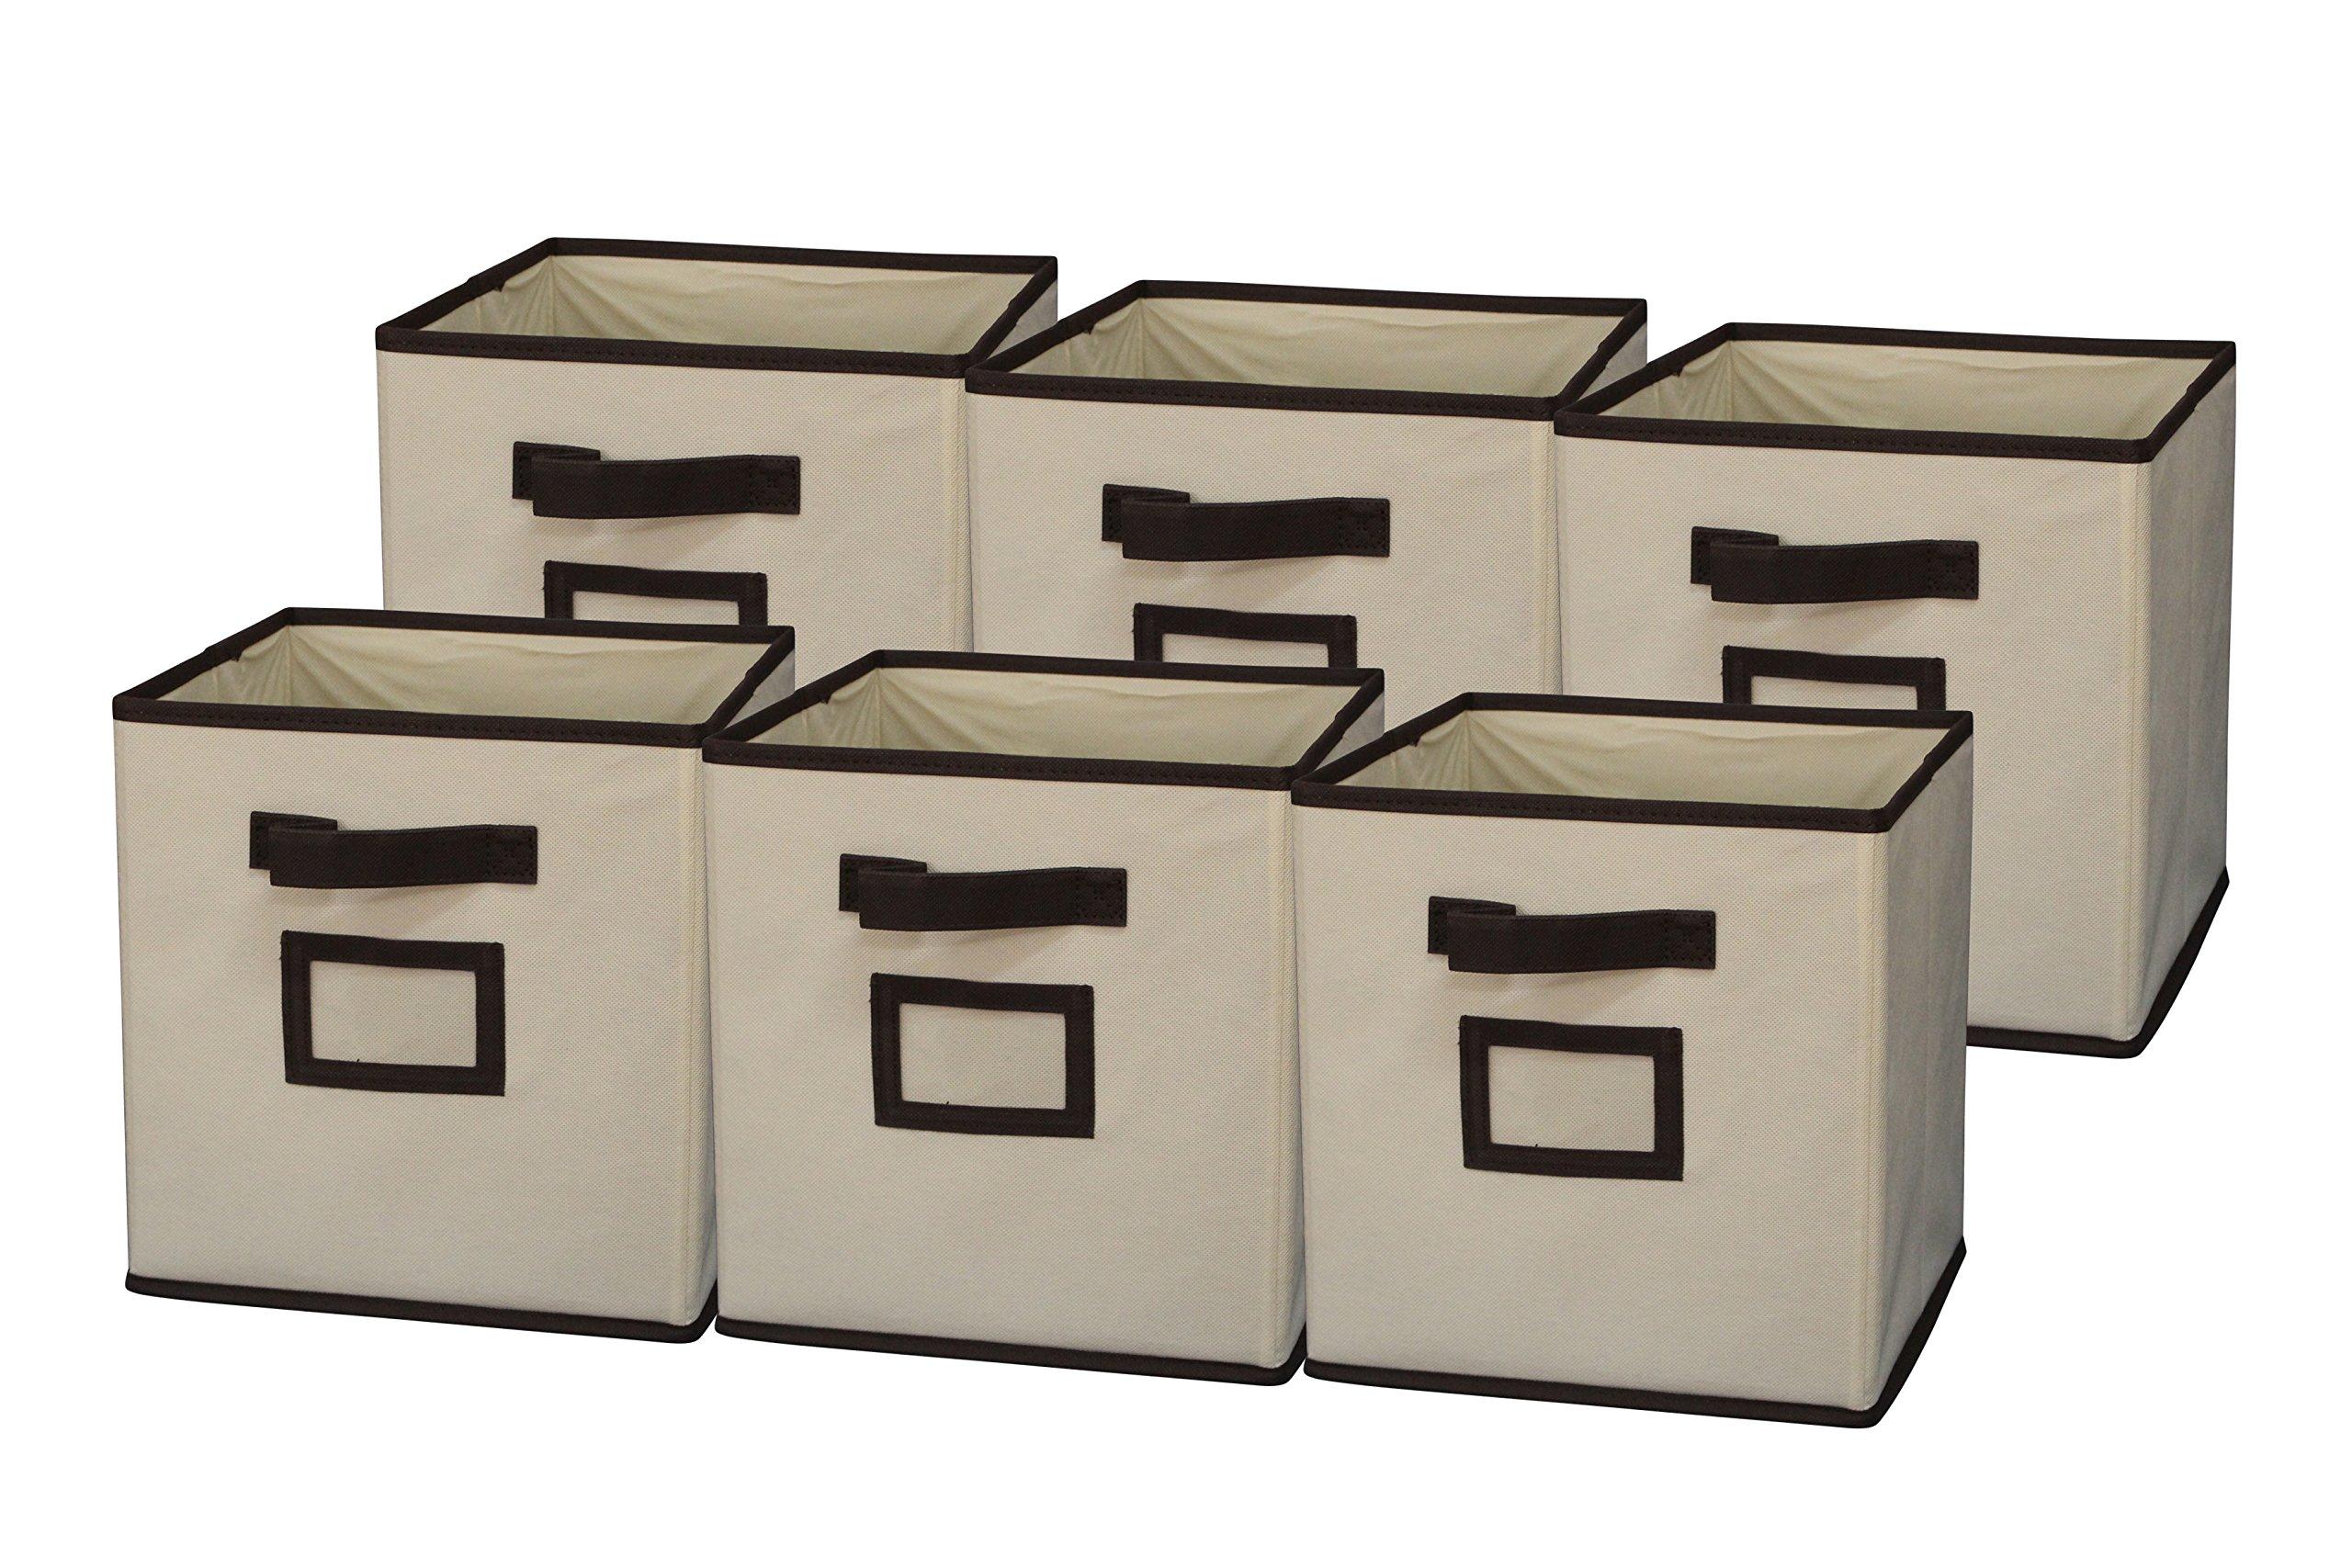 Sodynee Foldable Cloth Storage Cube Basket Bins Organizer Containers Drawers, 6 Pack, Coffee/Beige by Sodynee